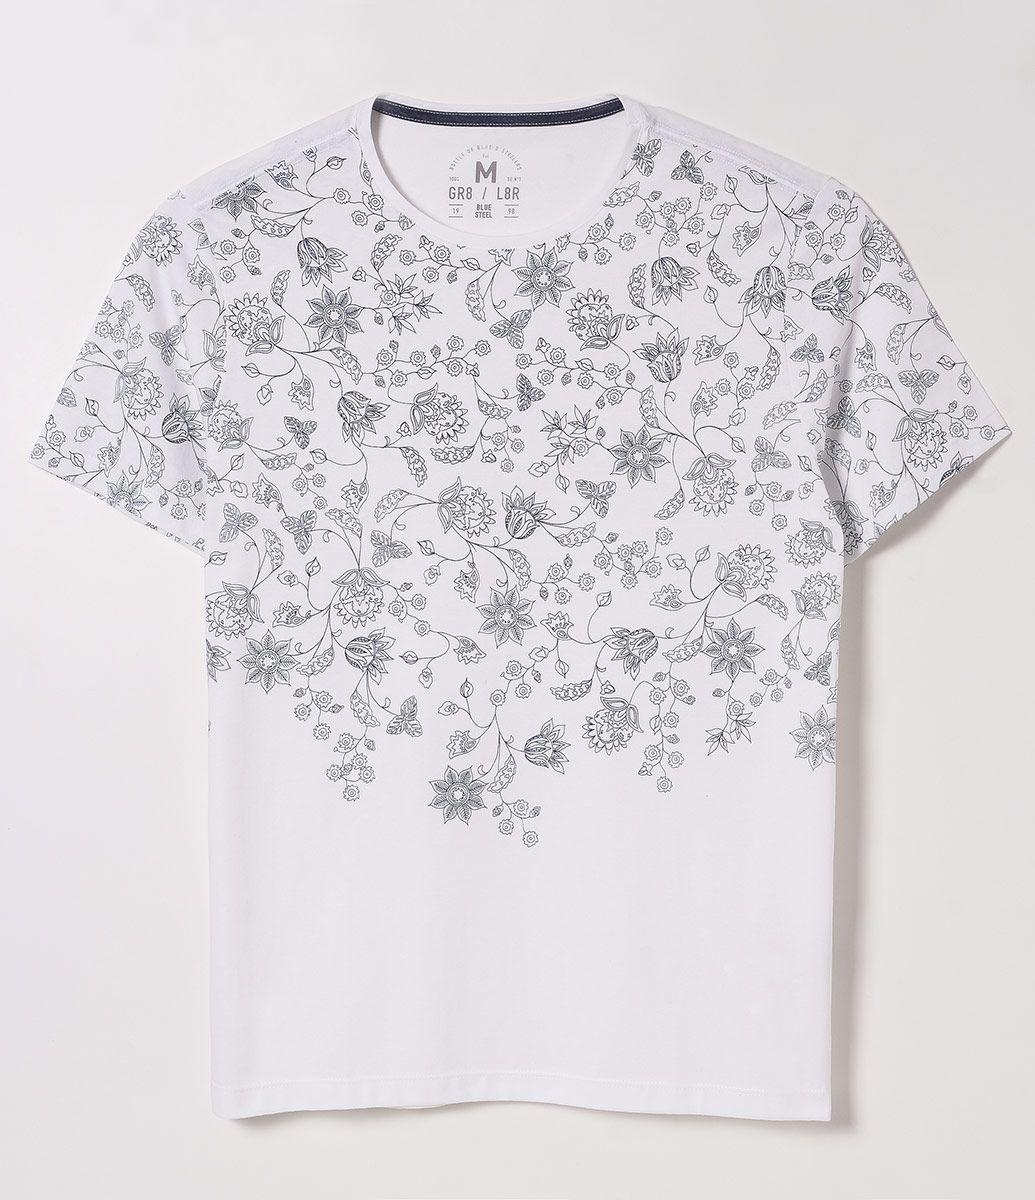 Camiseta Floral c5a41e5d2a55f